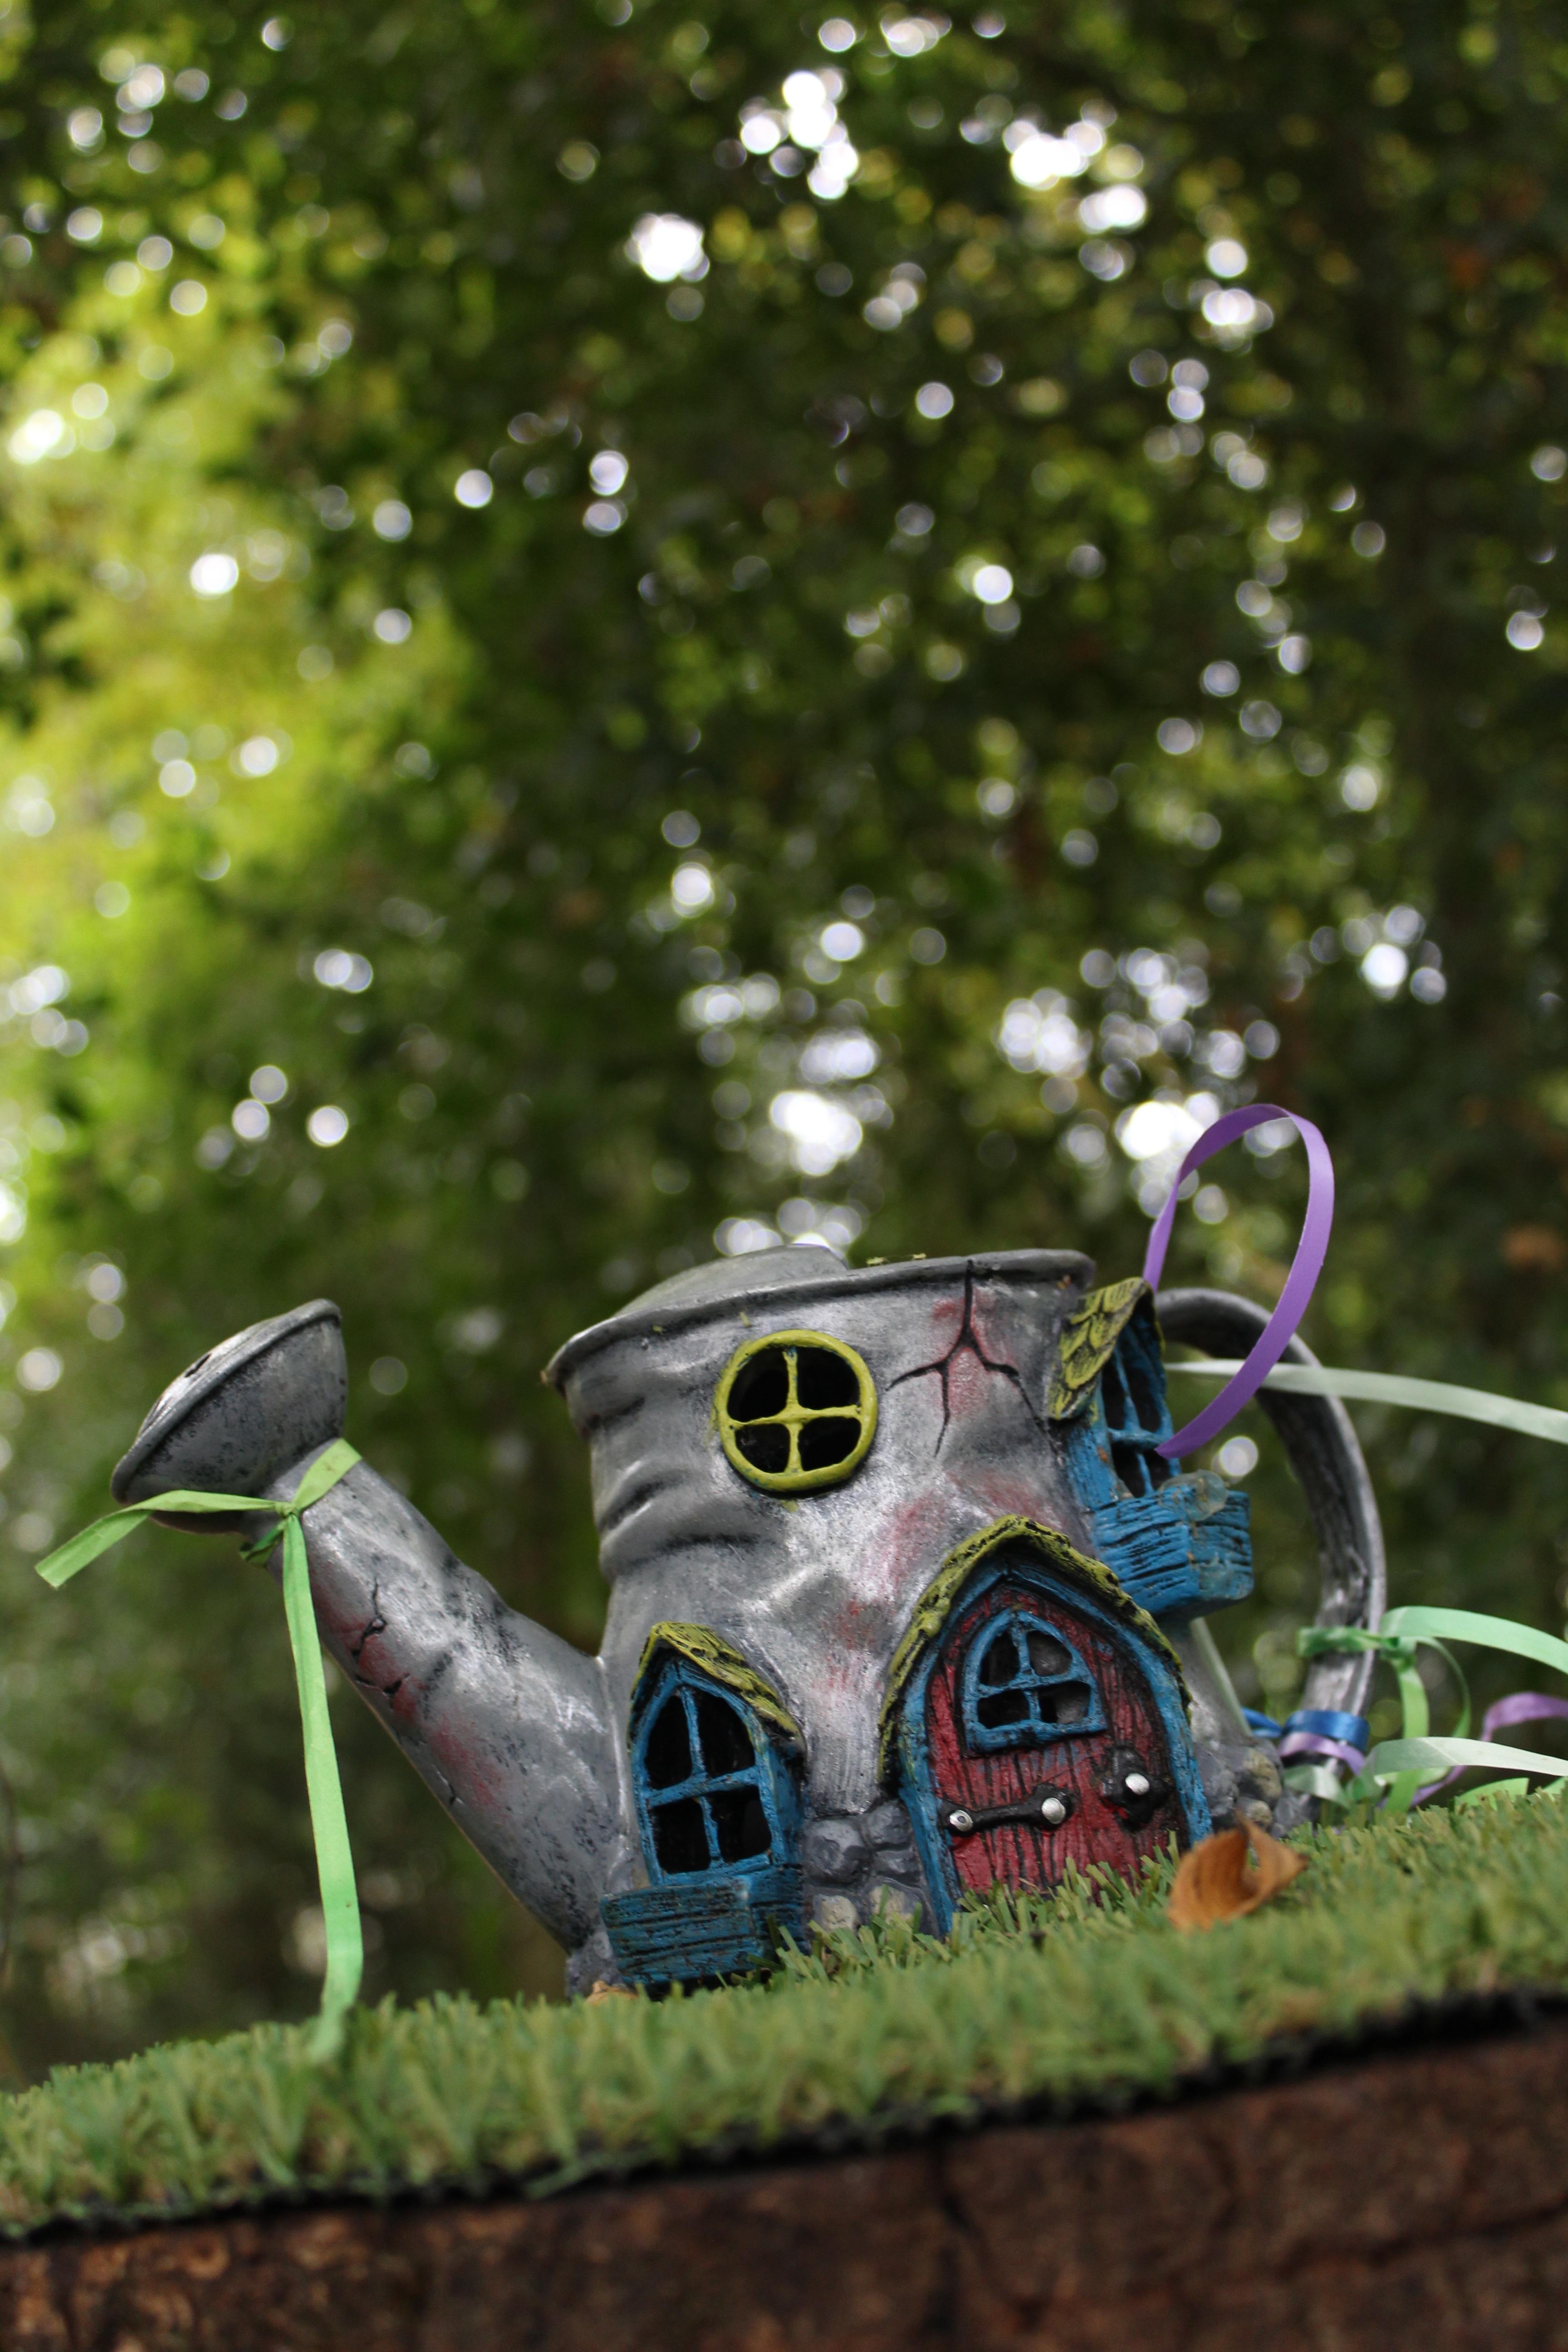 tree grass lawn house leaf flower teapot green vehicle garden art fantasy yard fairy